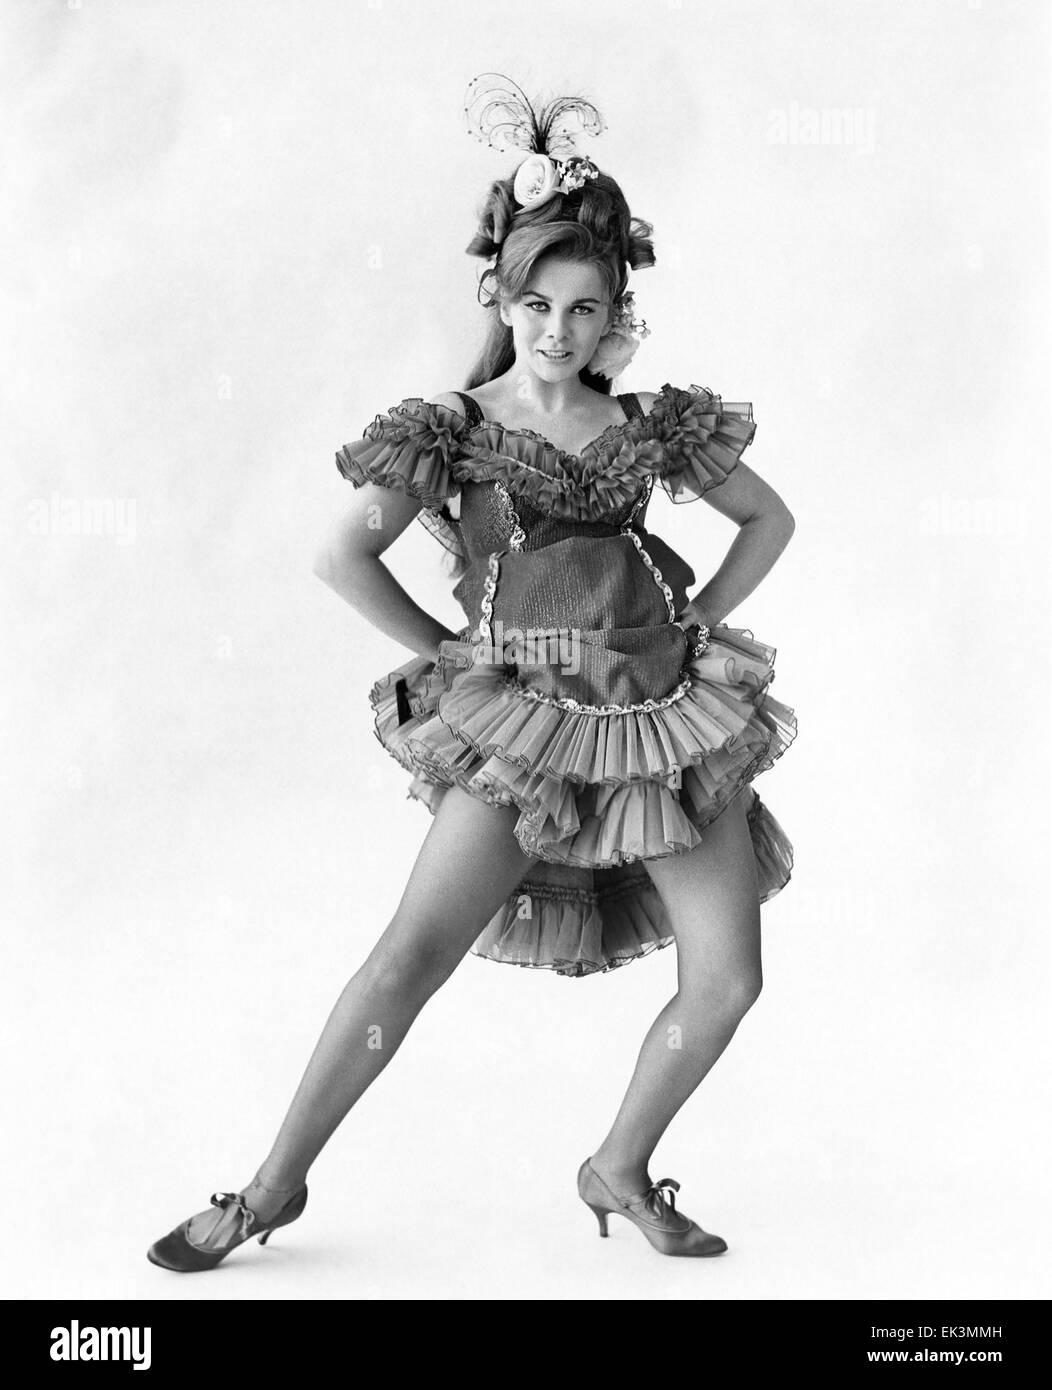 Ann-Margret, Publicity Portrait, circa late 1960's - Stock Image